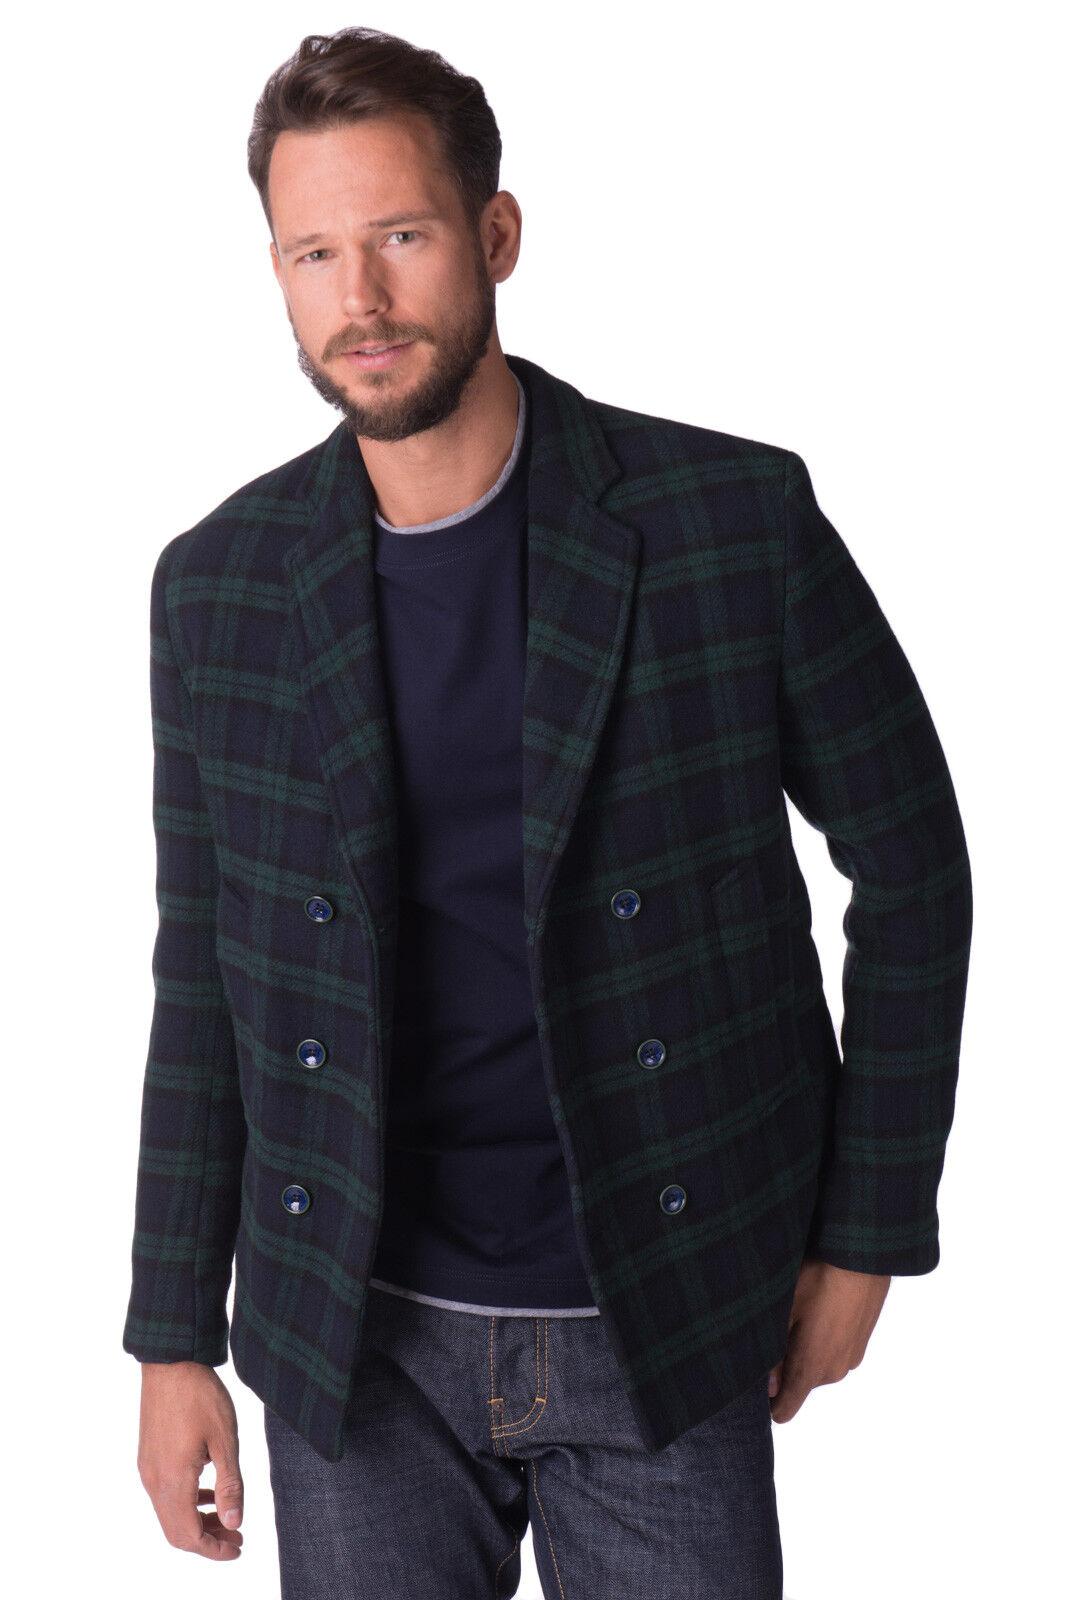 VINCENT TRADE Wool Blend Peacoat Größe 52 / XL Tartan Made in